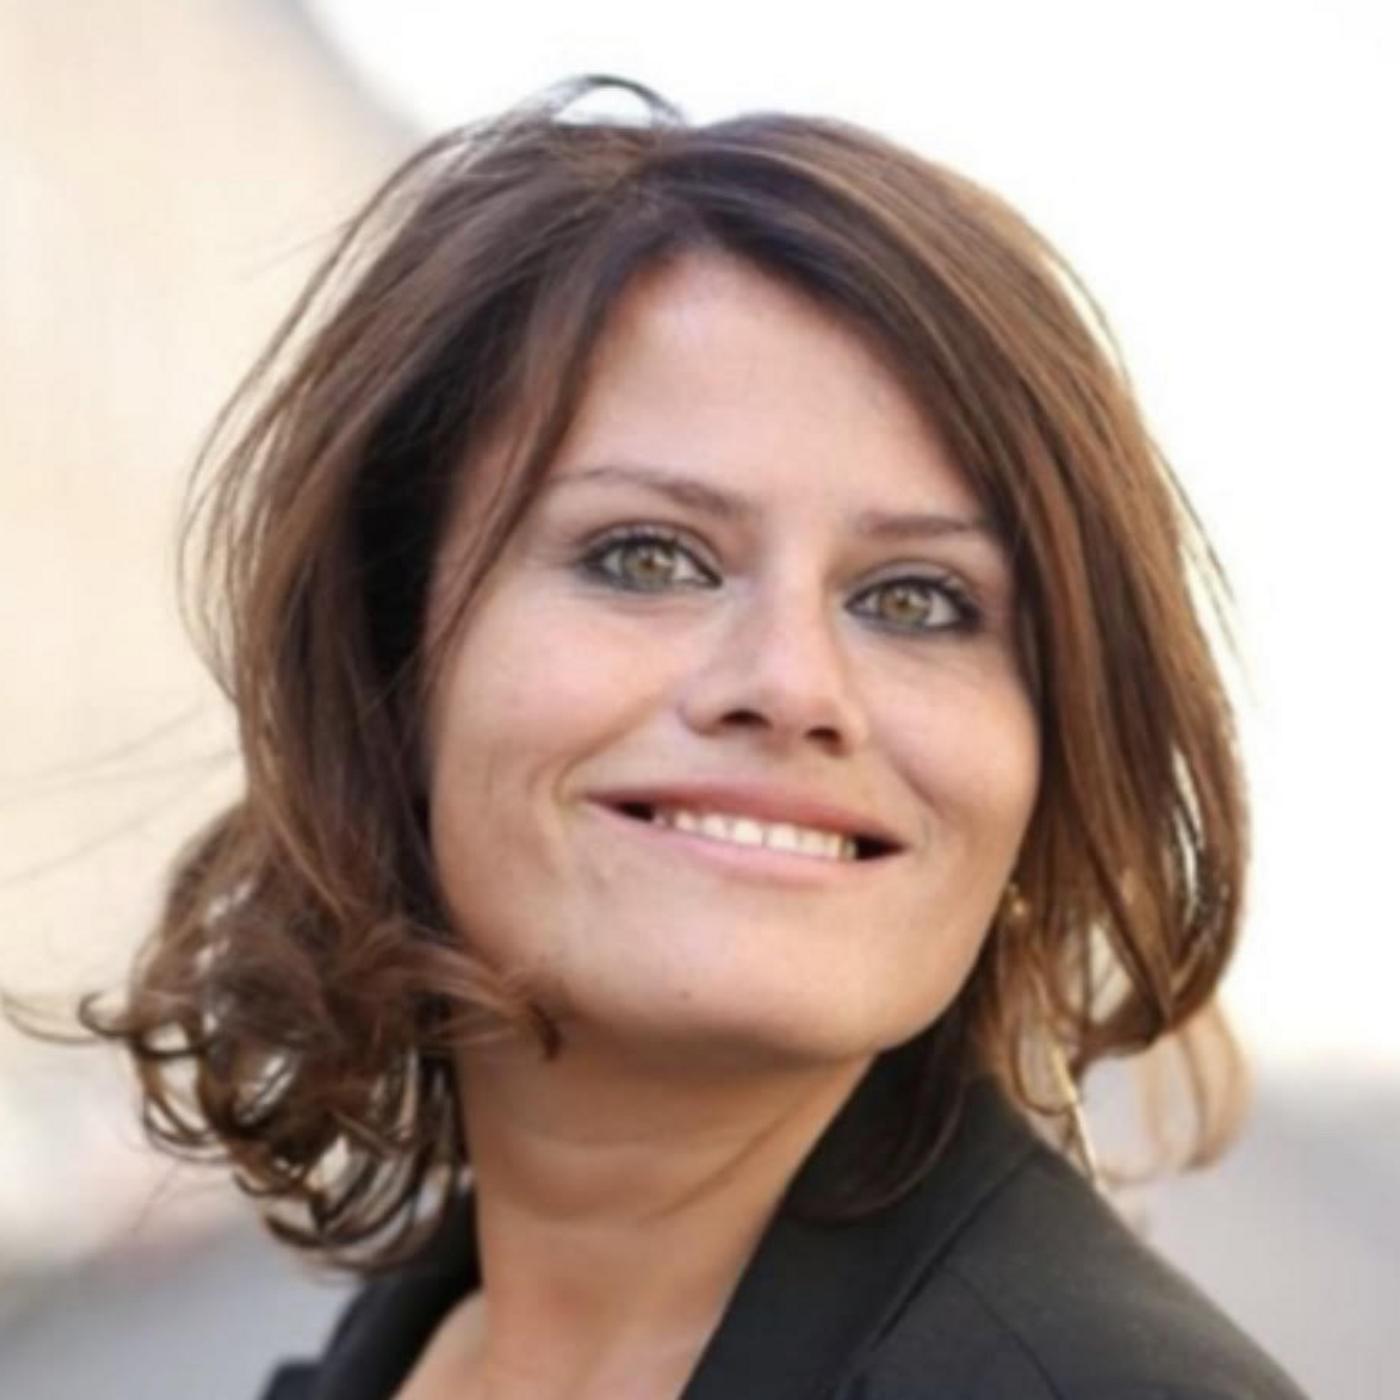 #19 - Passion Optimisme : Catherine Testa, créatrice d'un média 100% positif !